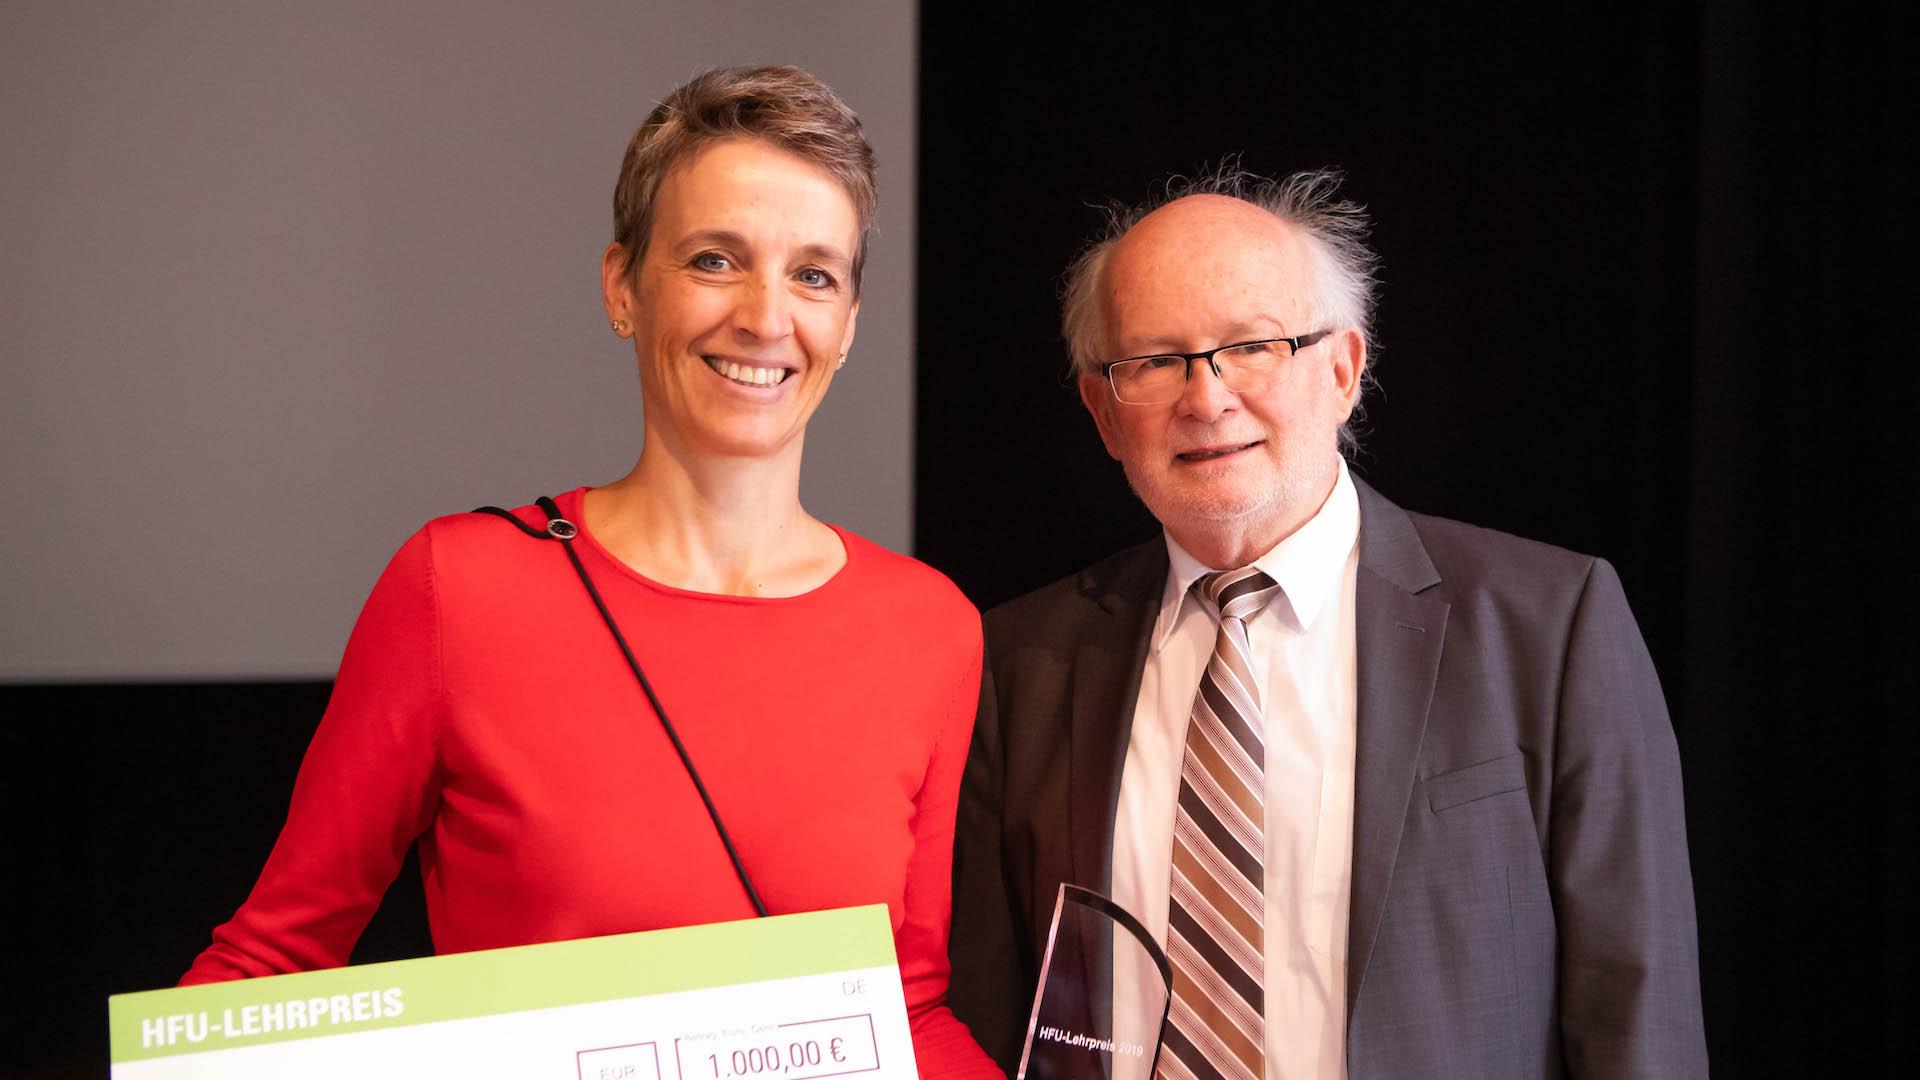 HFU Lehrpreis - Ada Rhode - Rektor Prof. Rolf Schofer